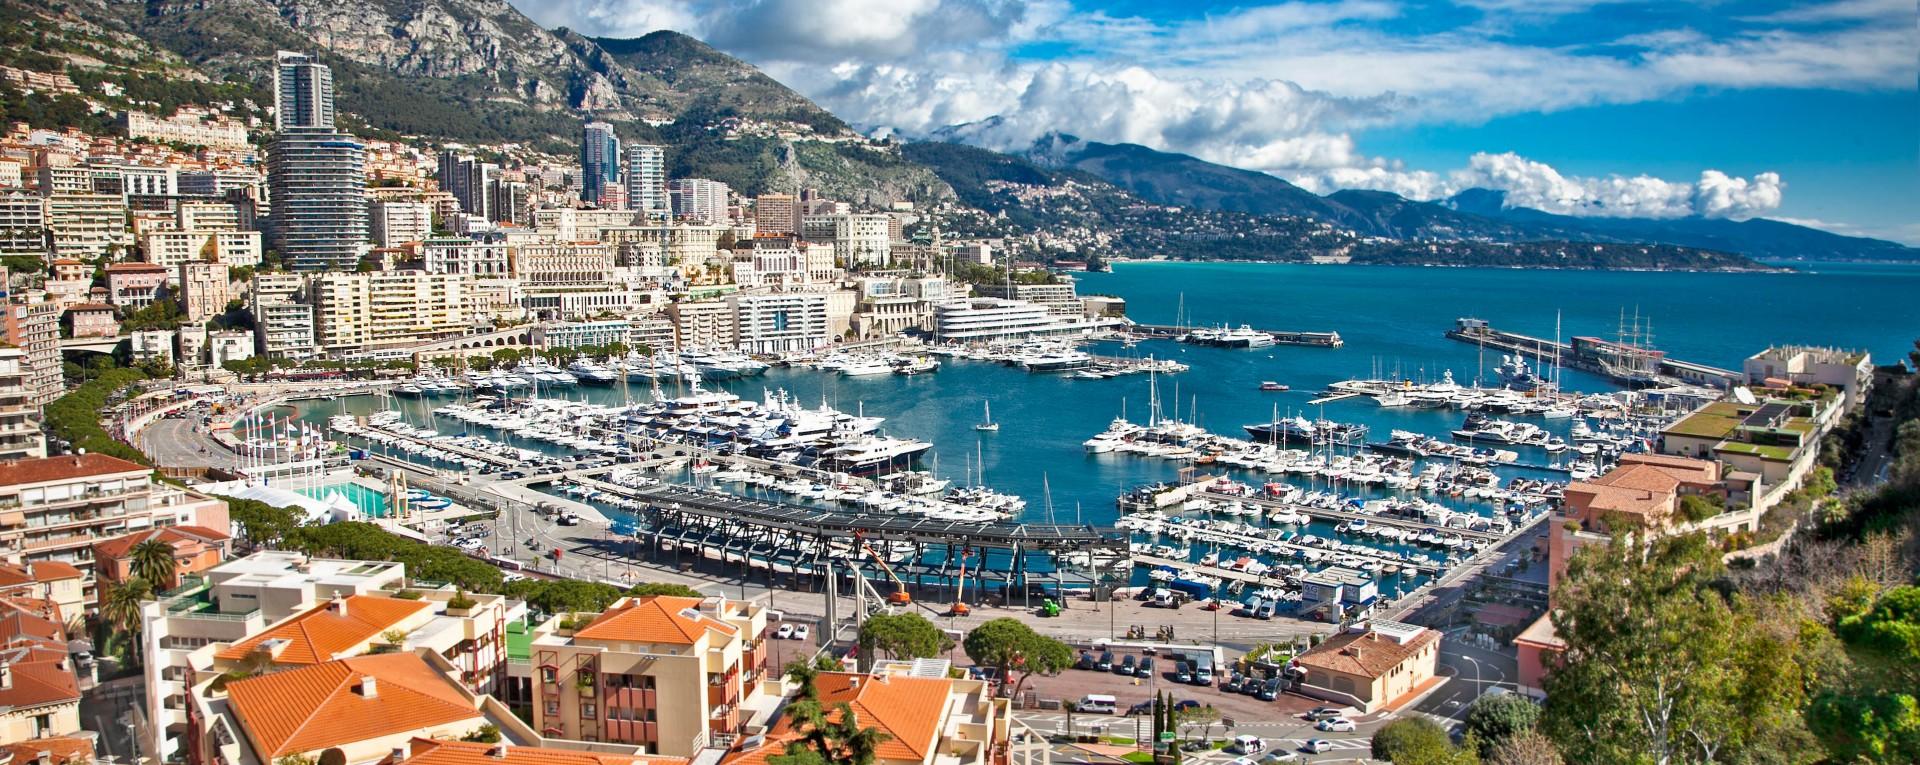 4. Monaco Apartment